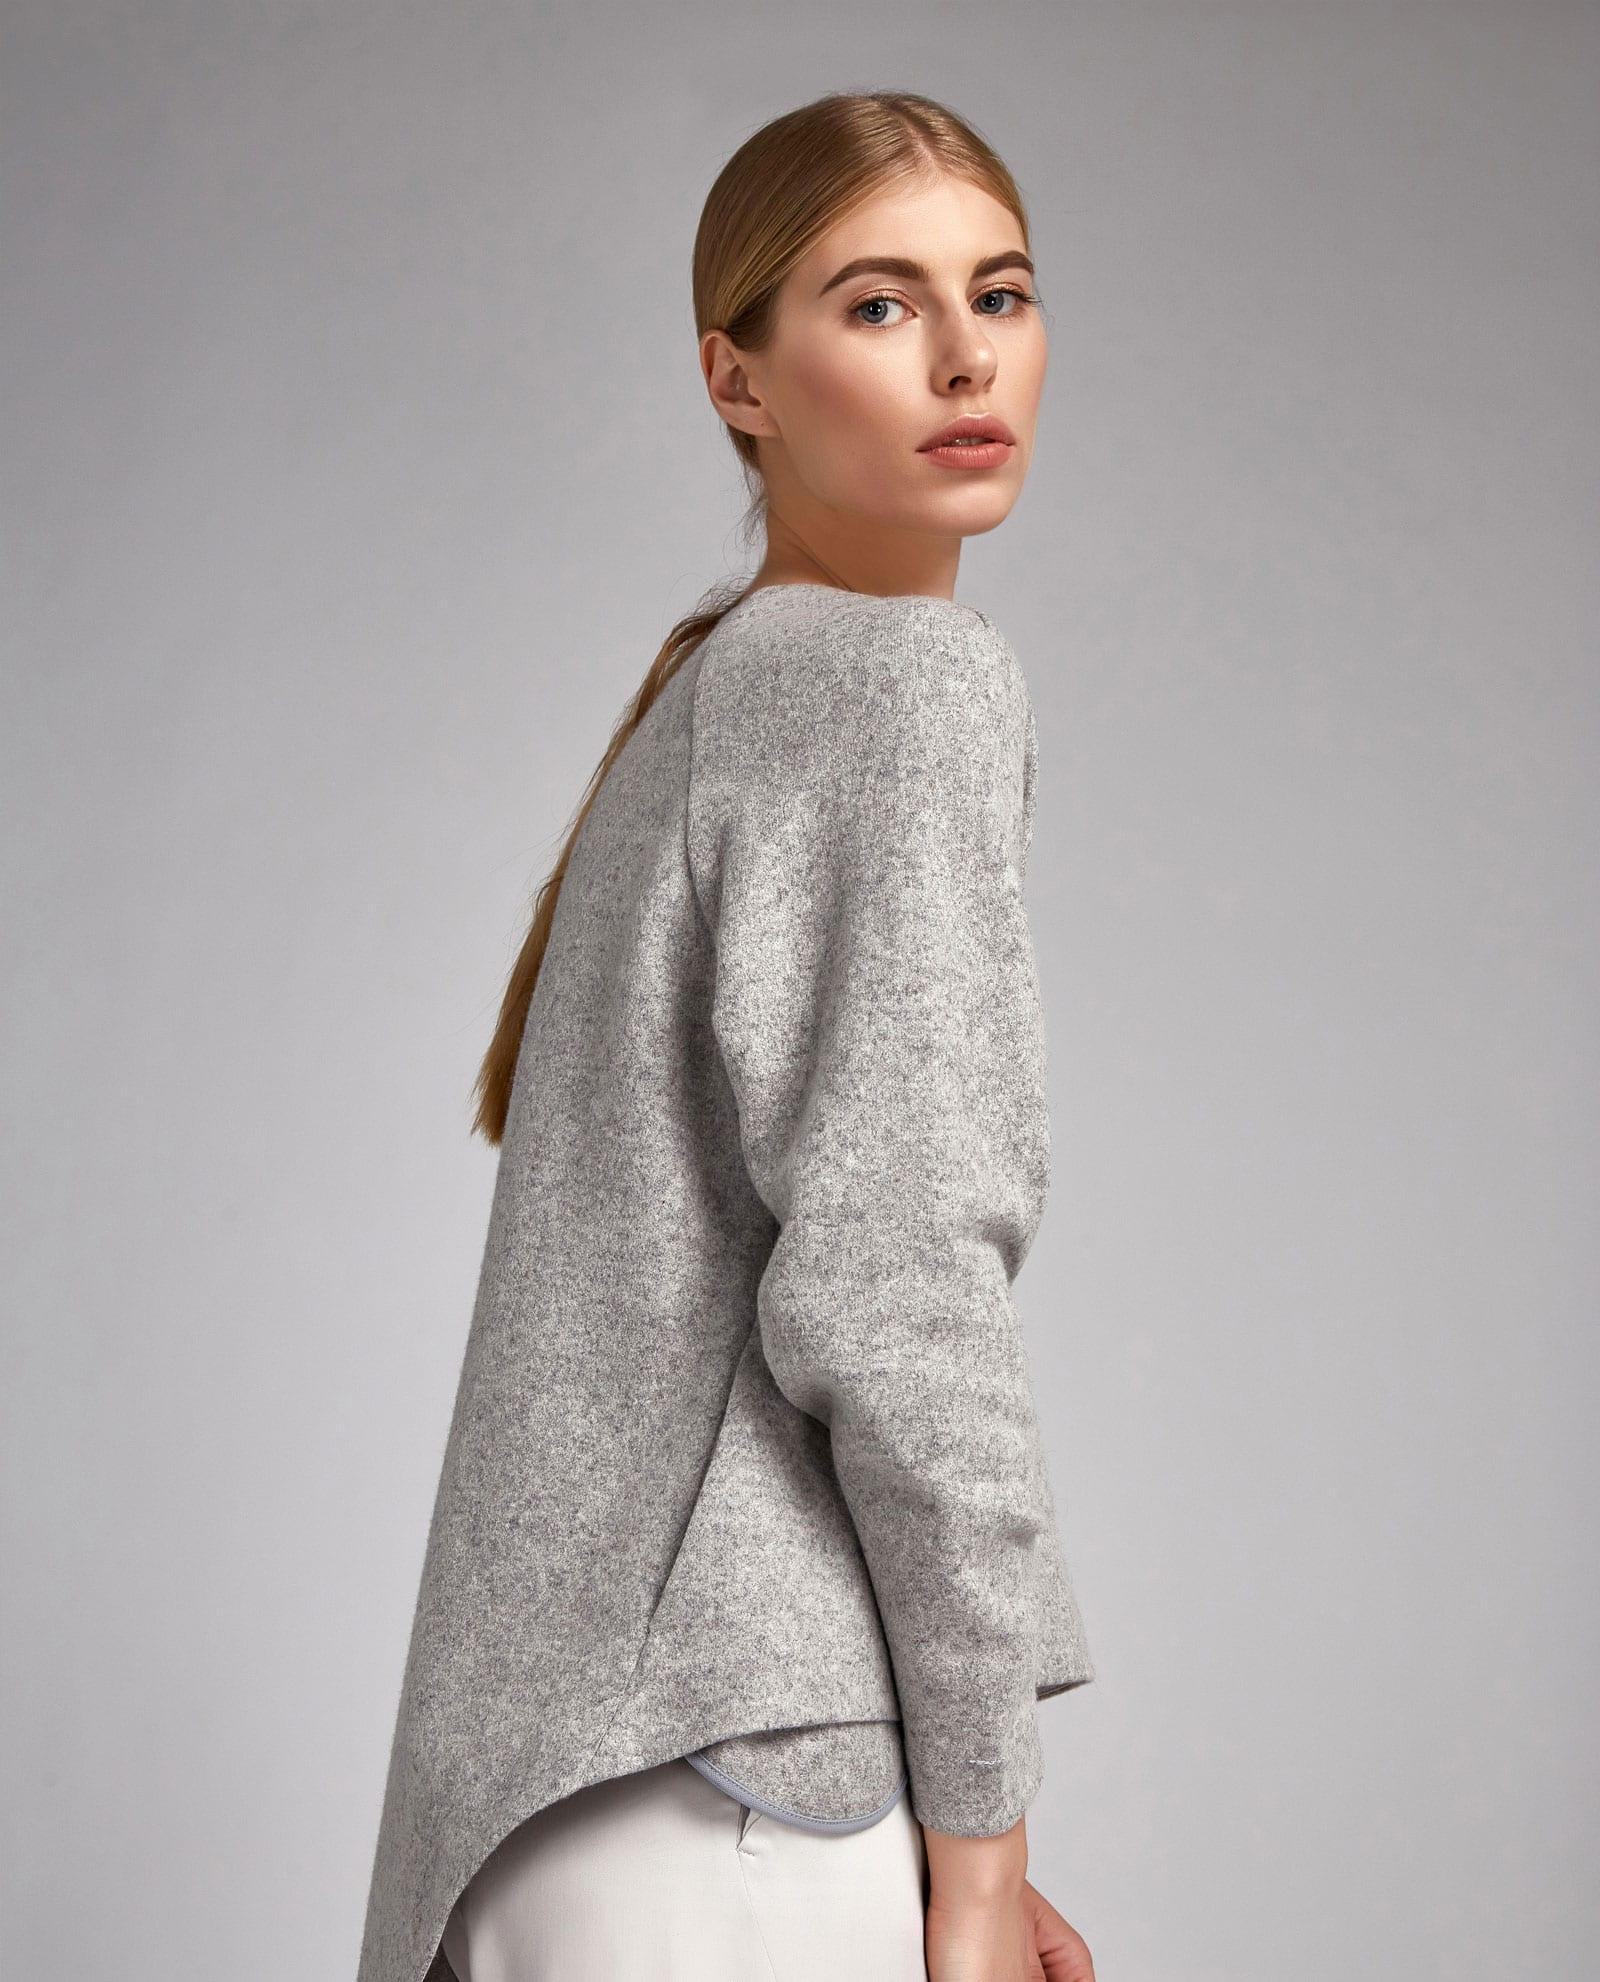 gray top04